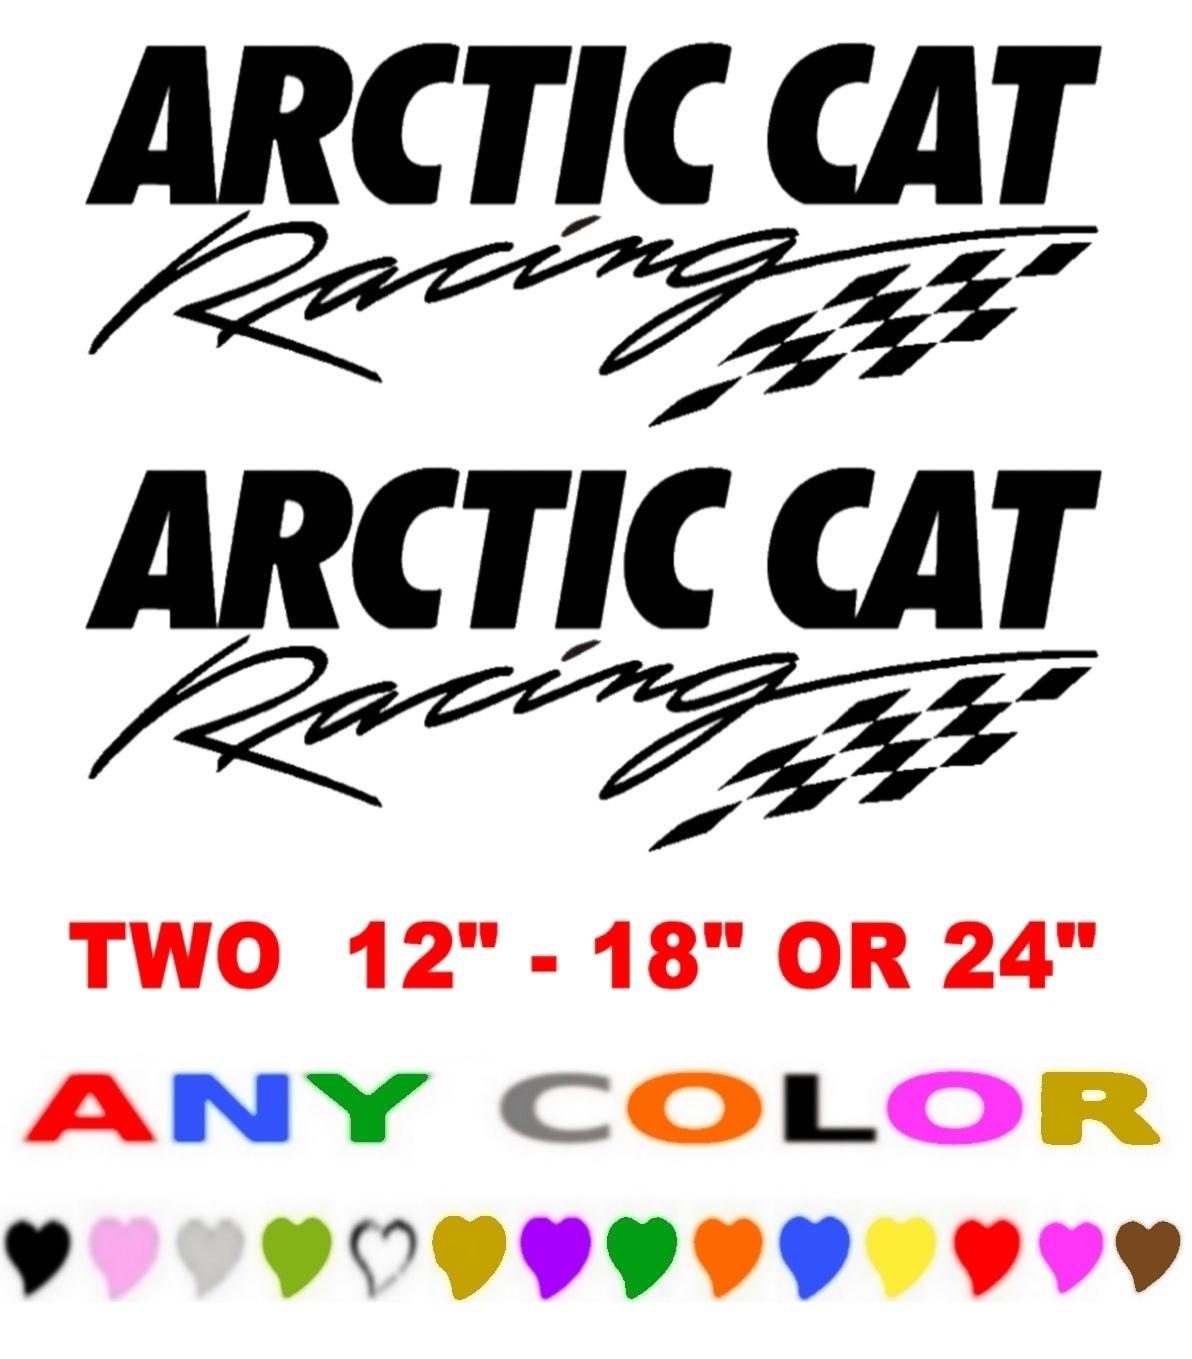 4 BLACK arctic cat decal sticker sno pro xf zr hcr limited f5 f7 f 5 800 decals